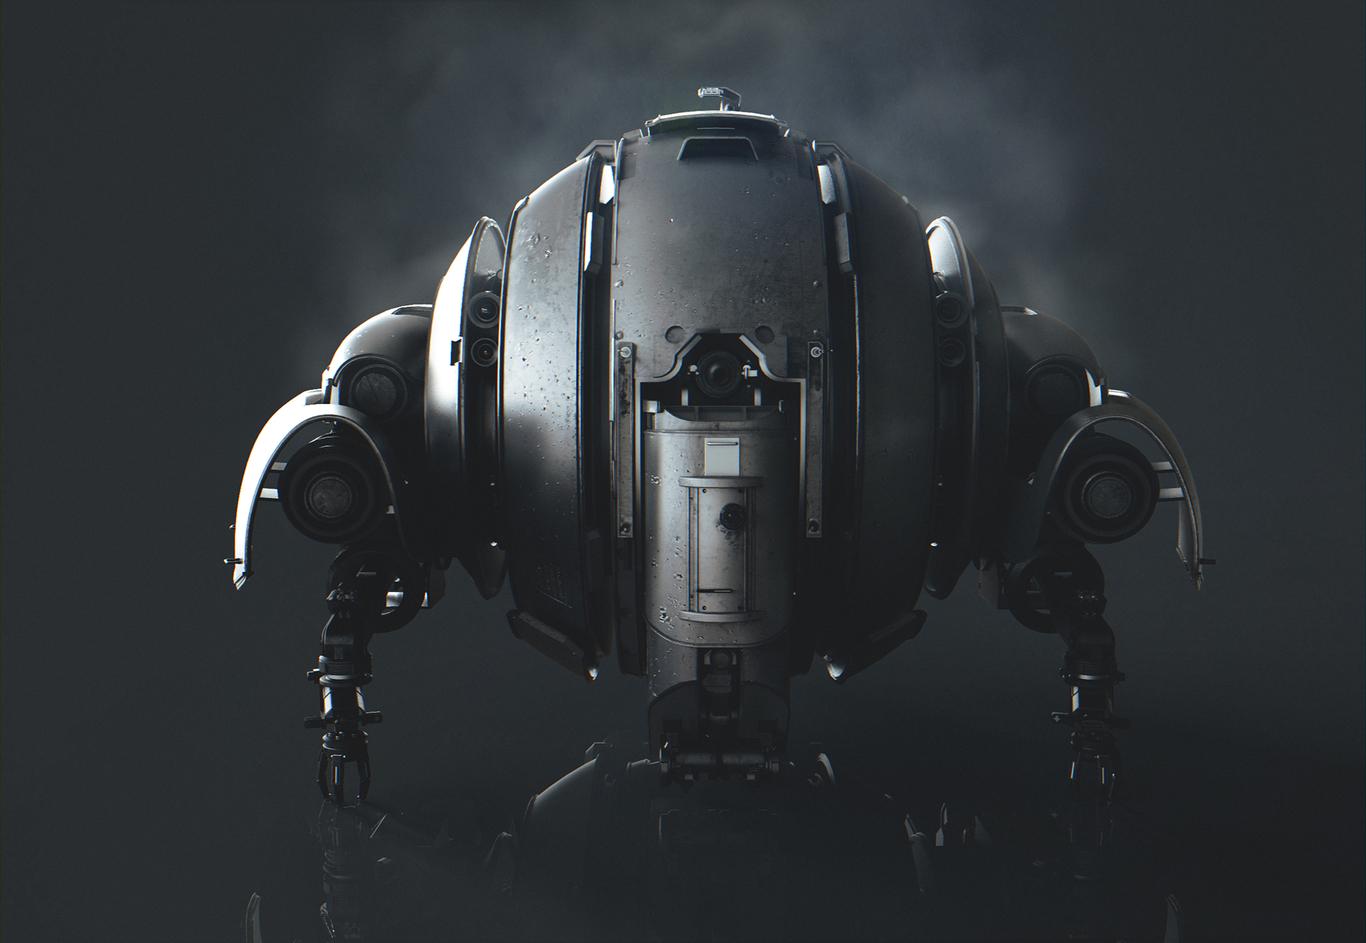 Fedos47 spheric drone studio 1 c85e3942 0aqn